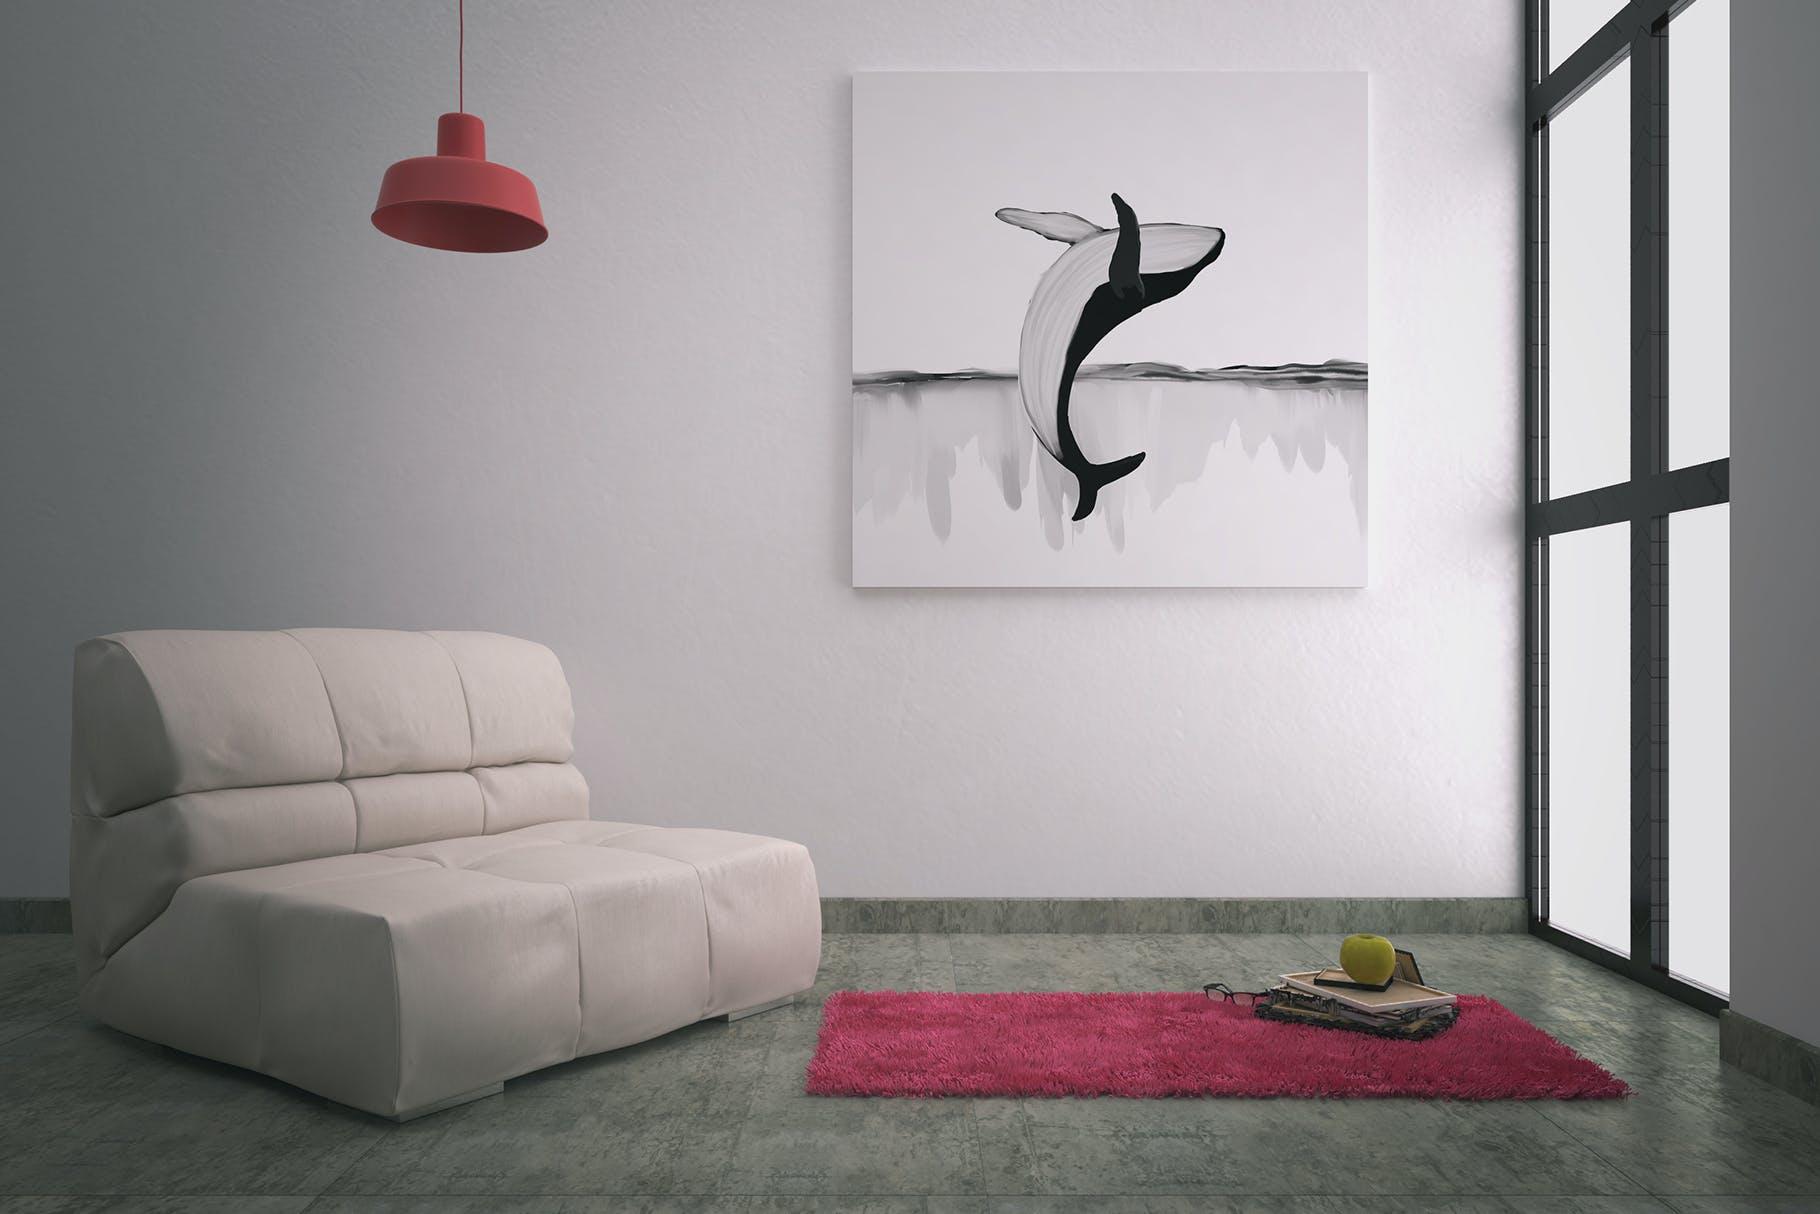 30款精美高清手绘鲸鱼轮船山脉图片素材 Whales – Black And White Prints插图(5)